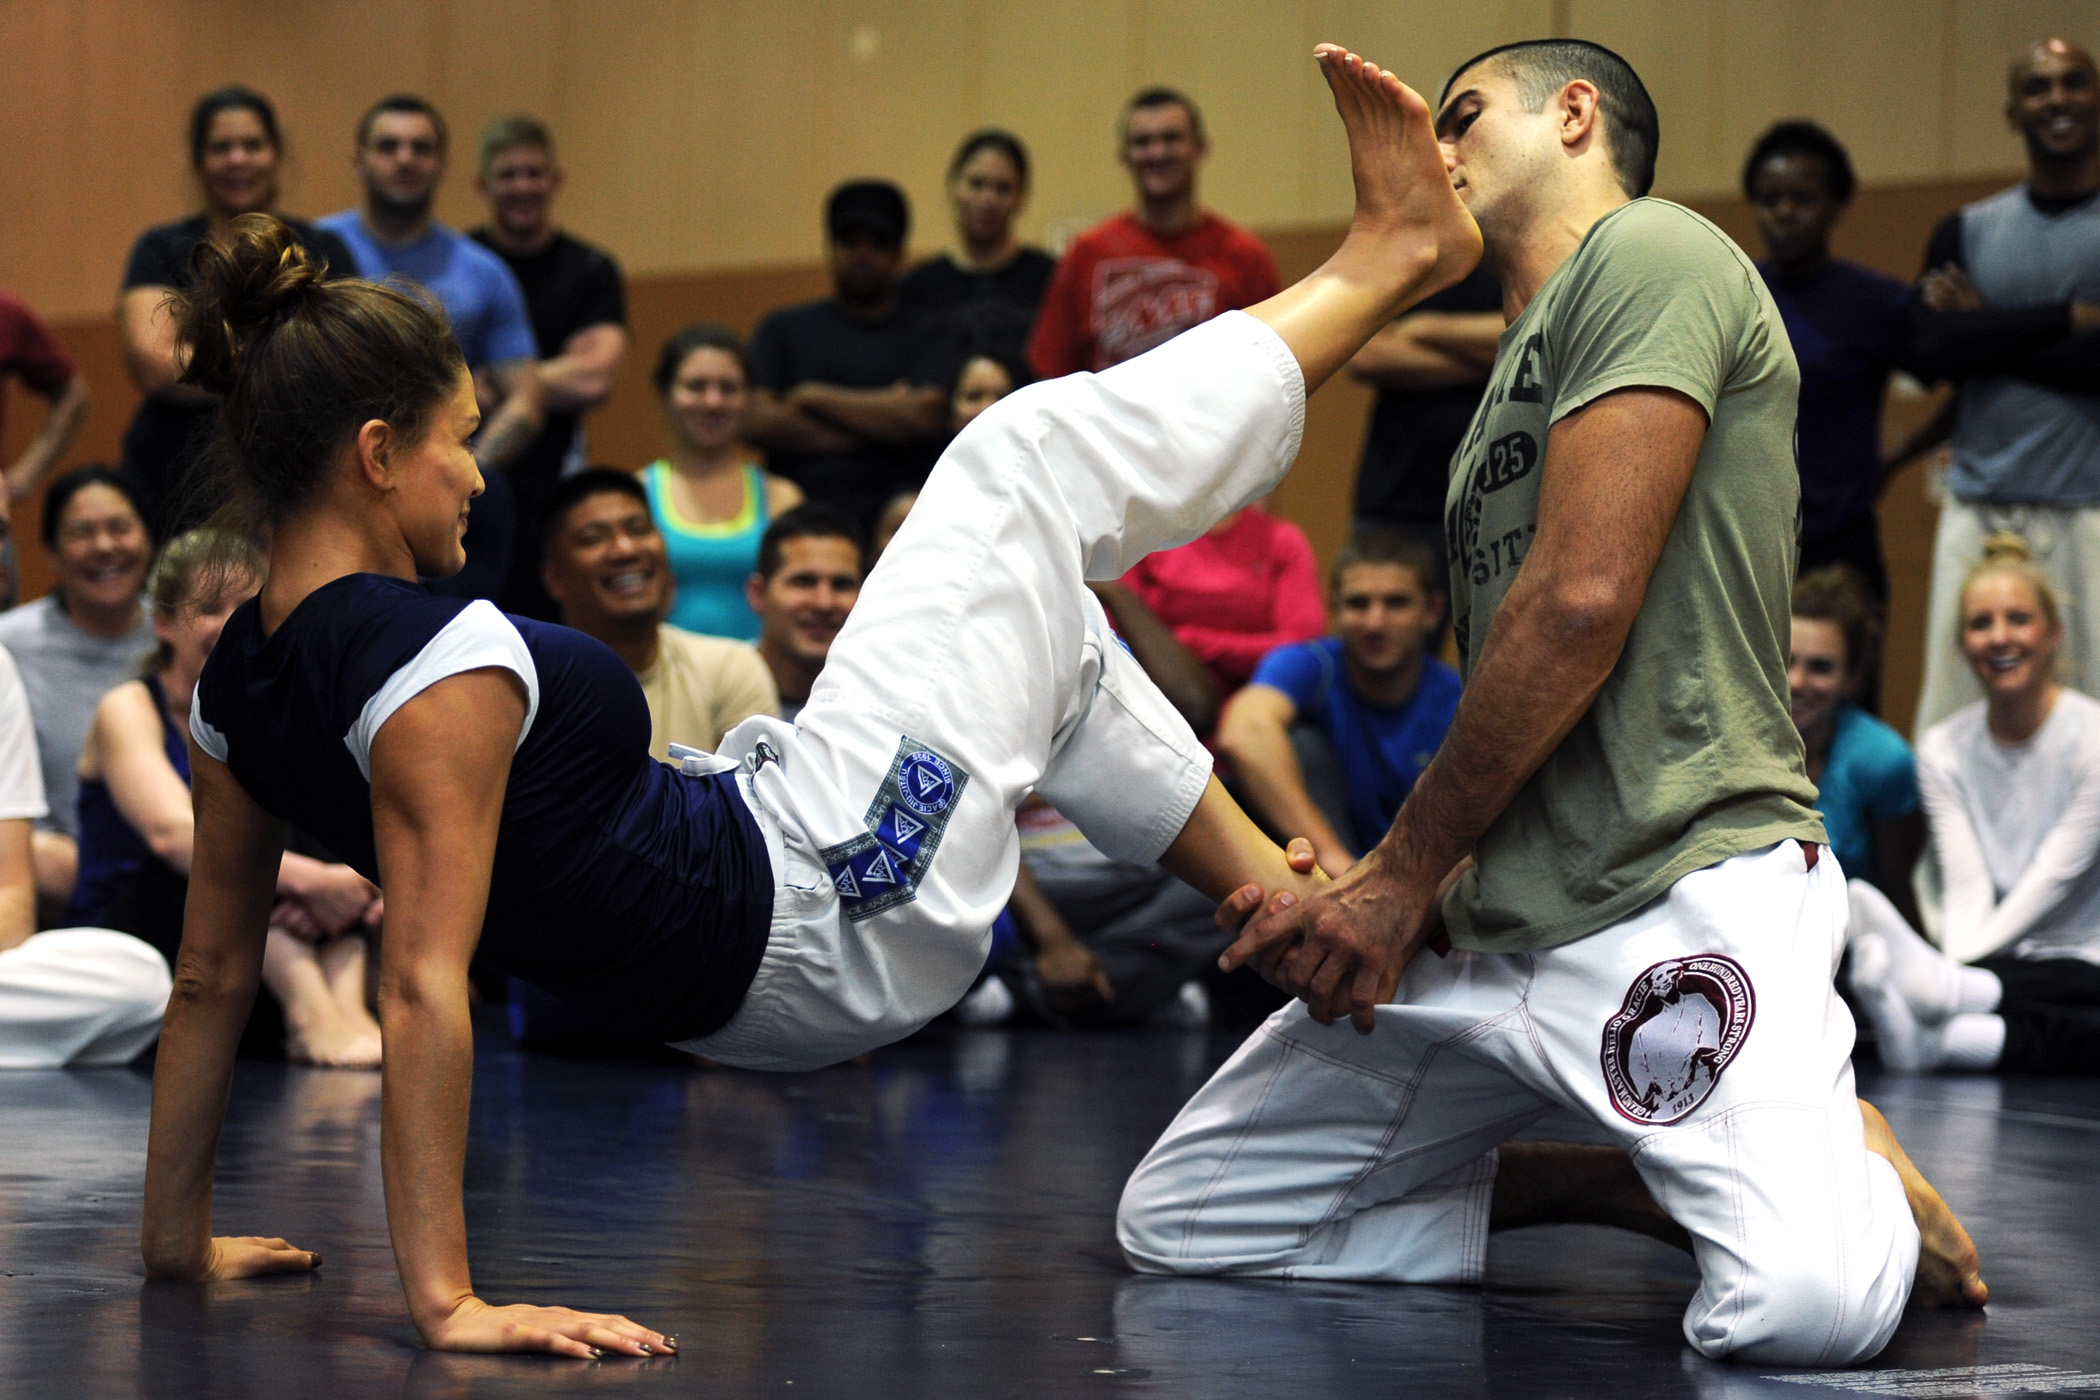 Women Empowered Seminar Instills Jiu Jitsu Self Defense